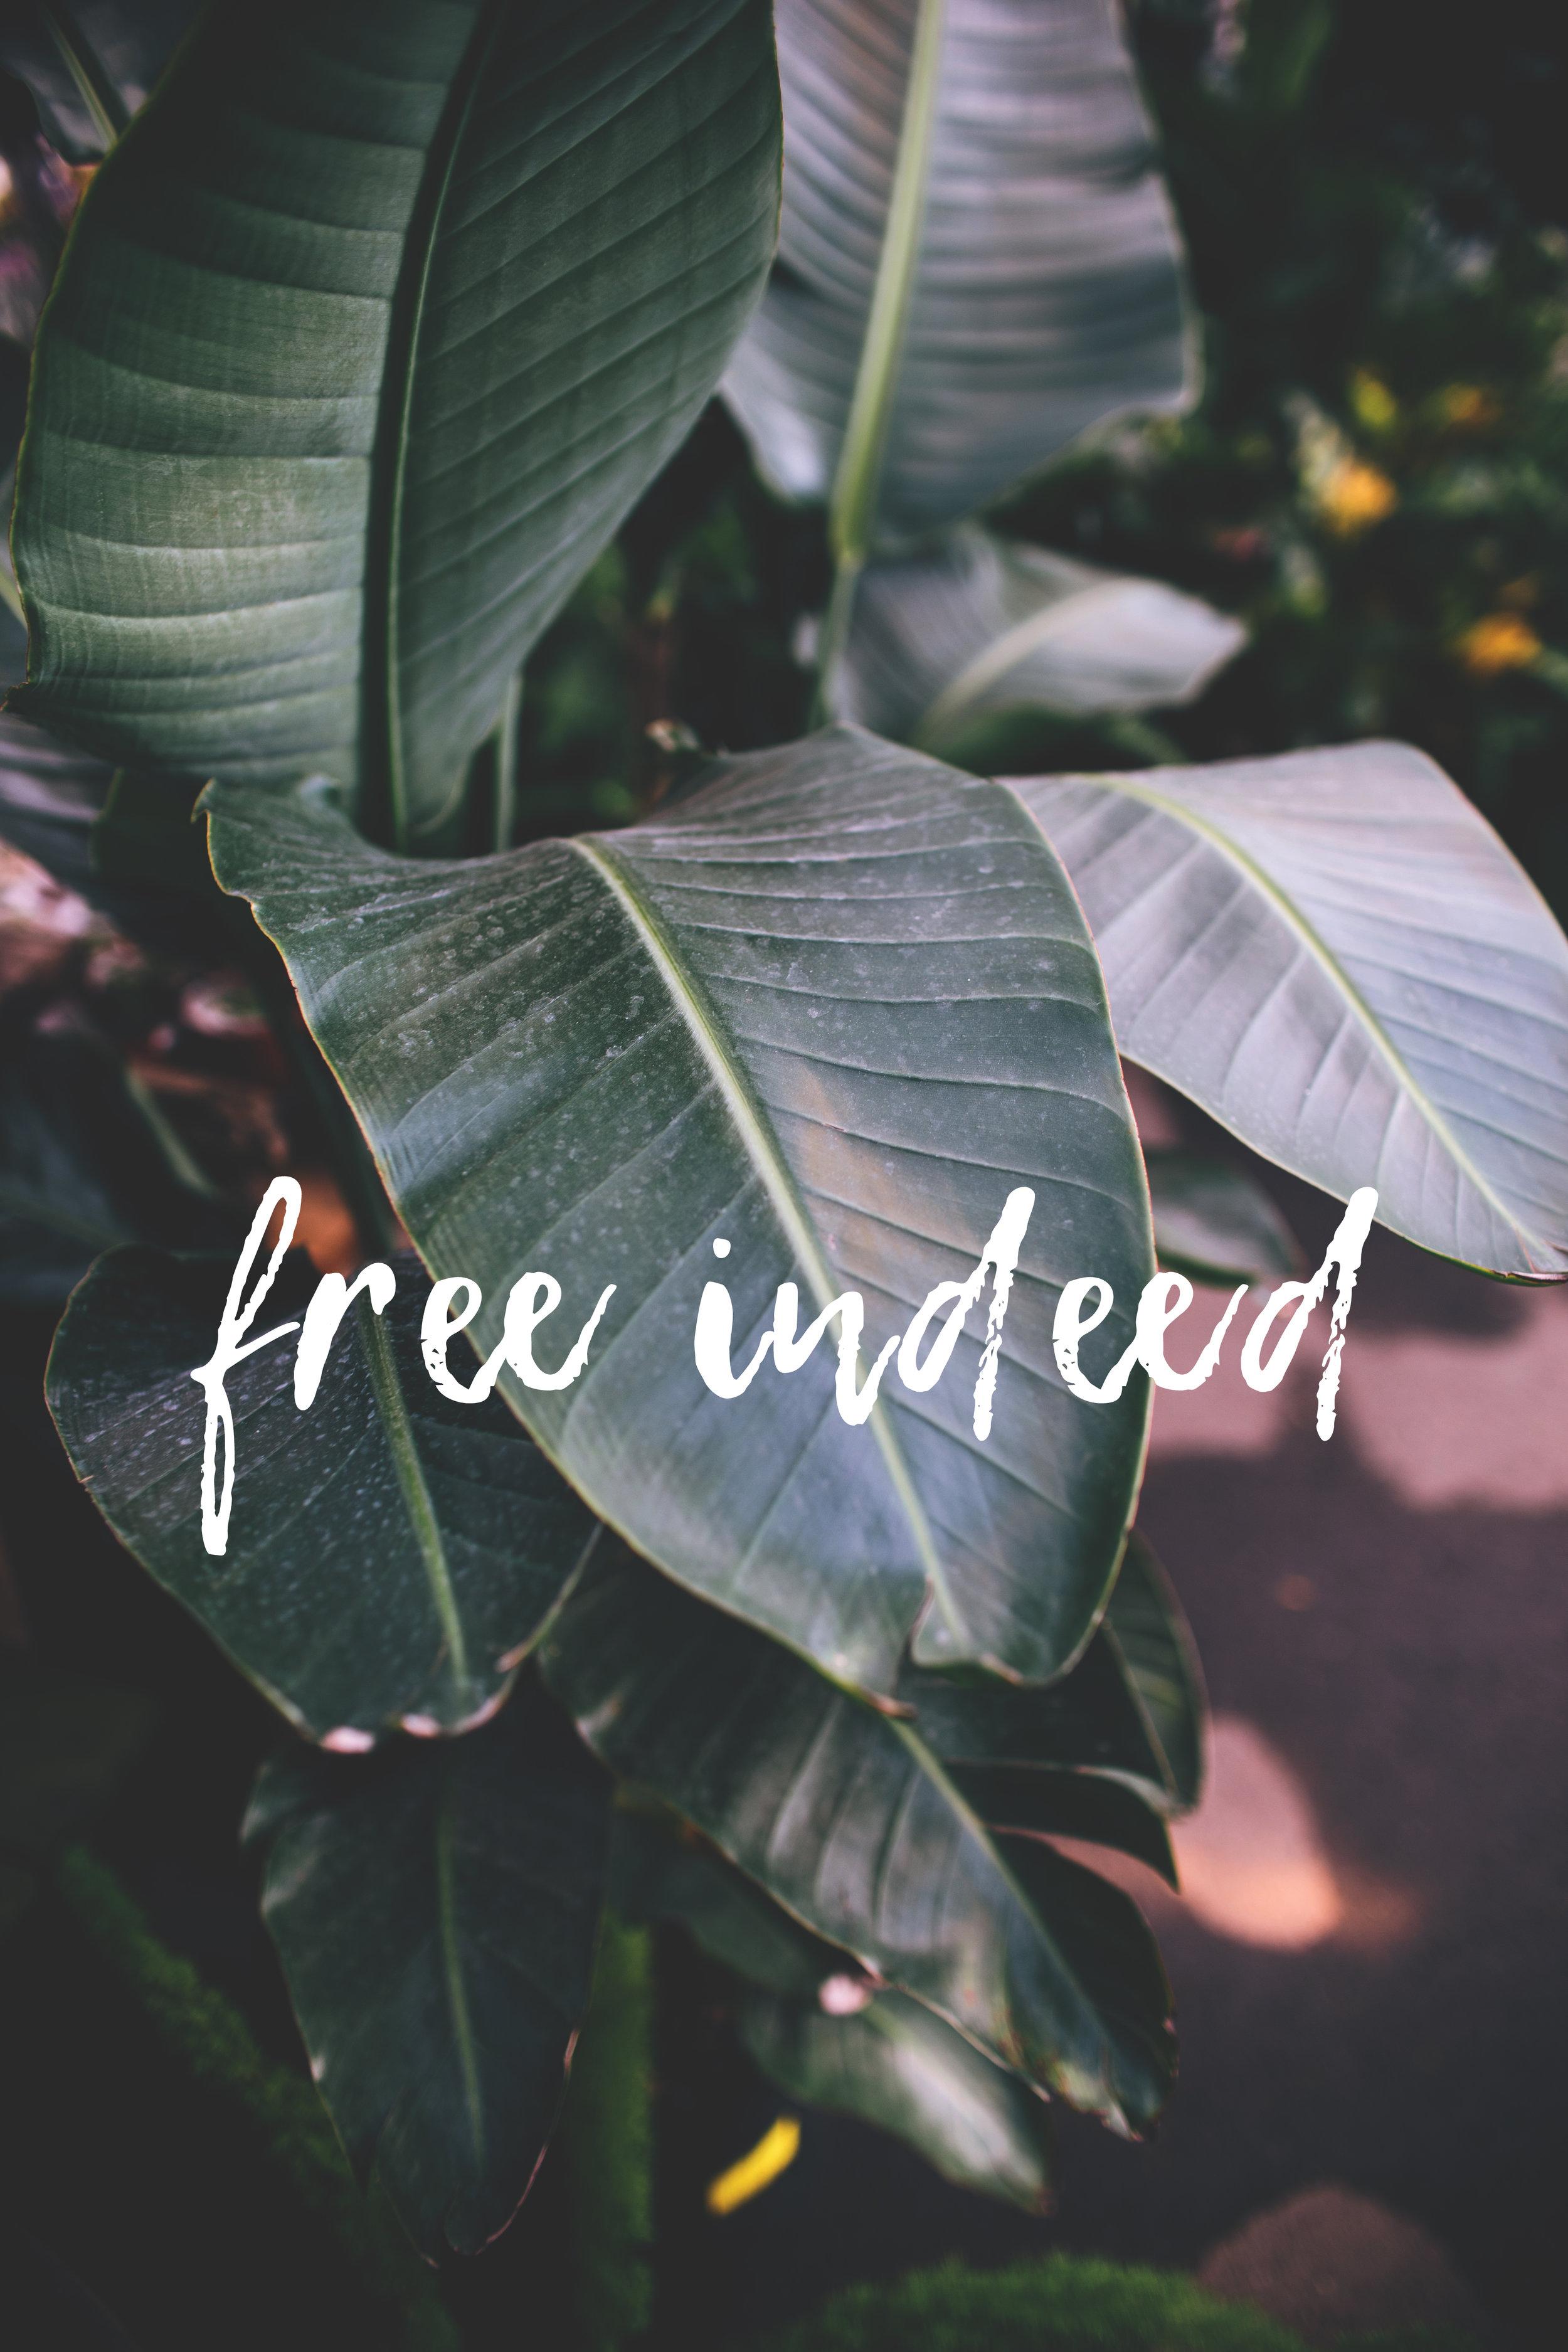 freeindeedpostcard.jpg